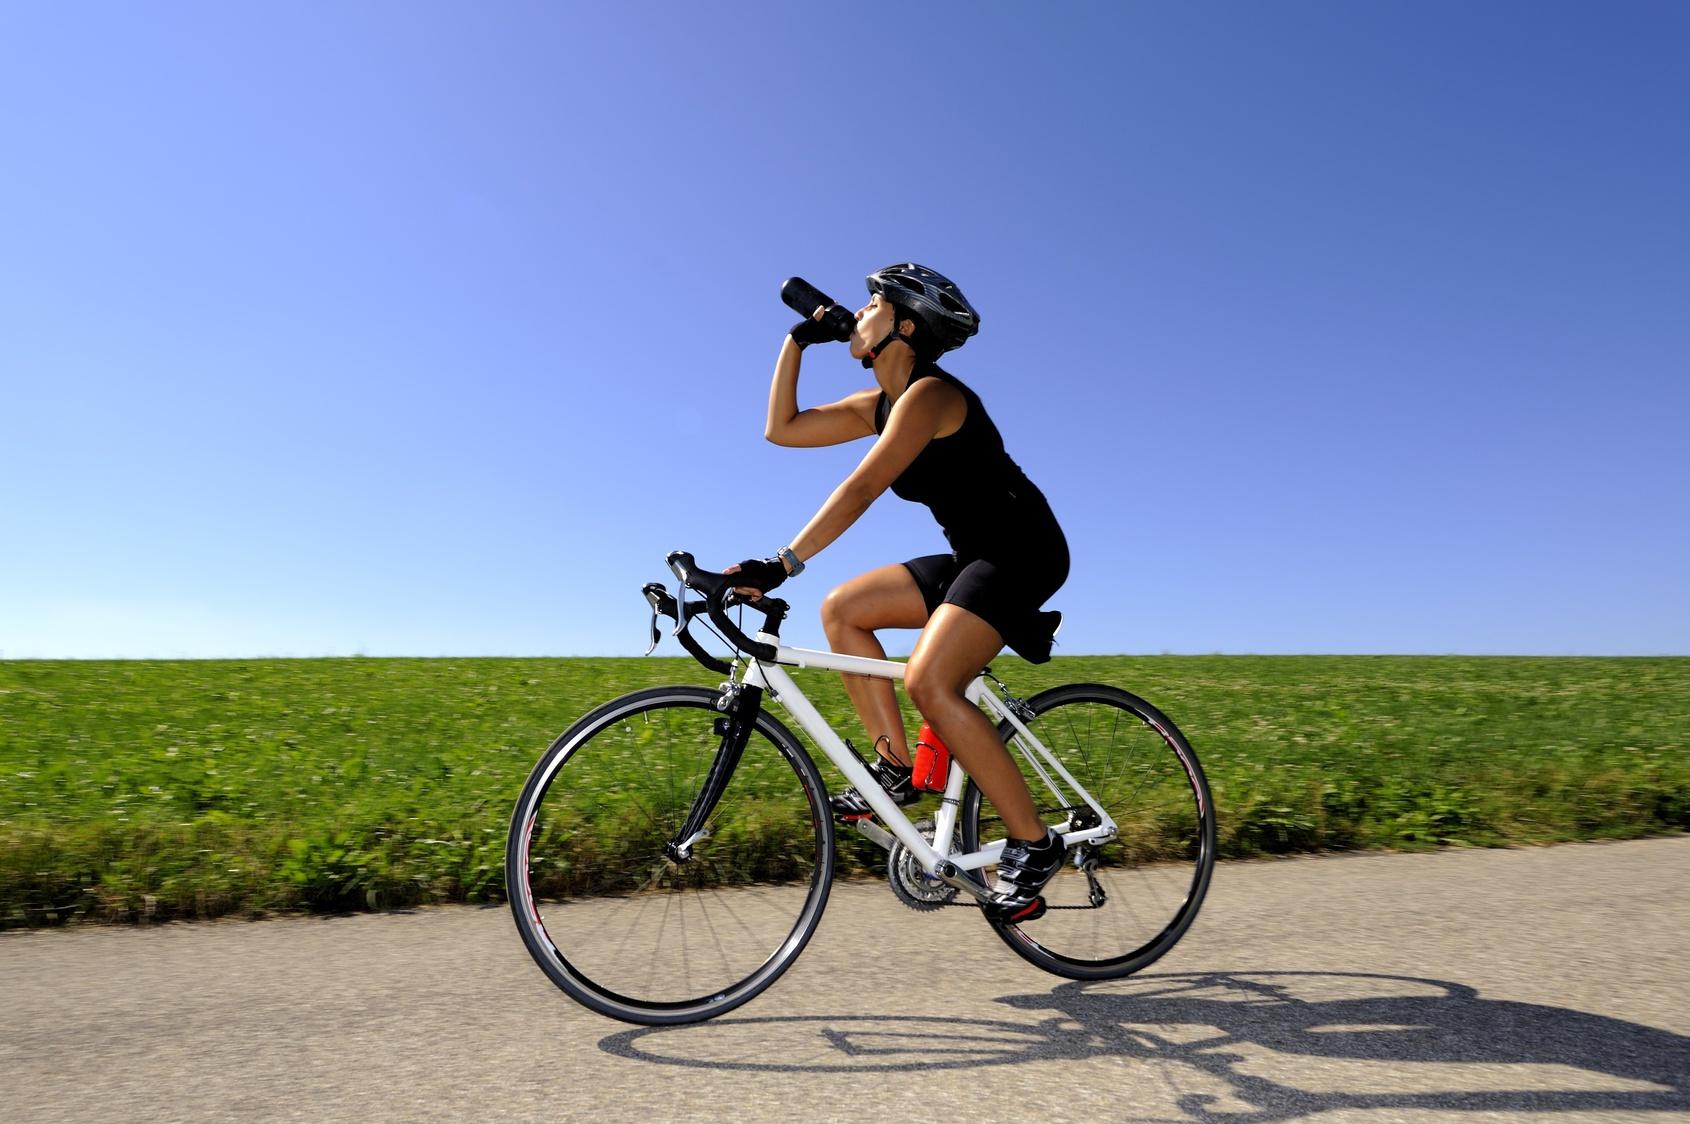 Risultati immagini per sport di endurance